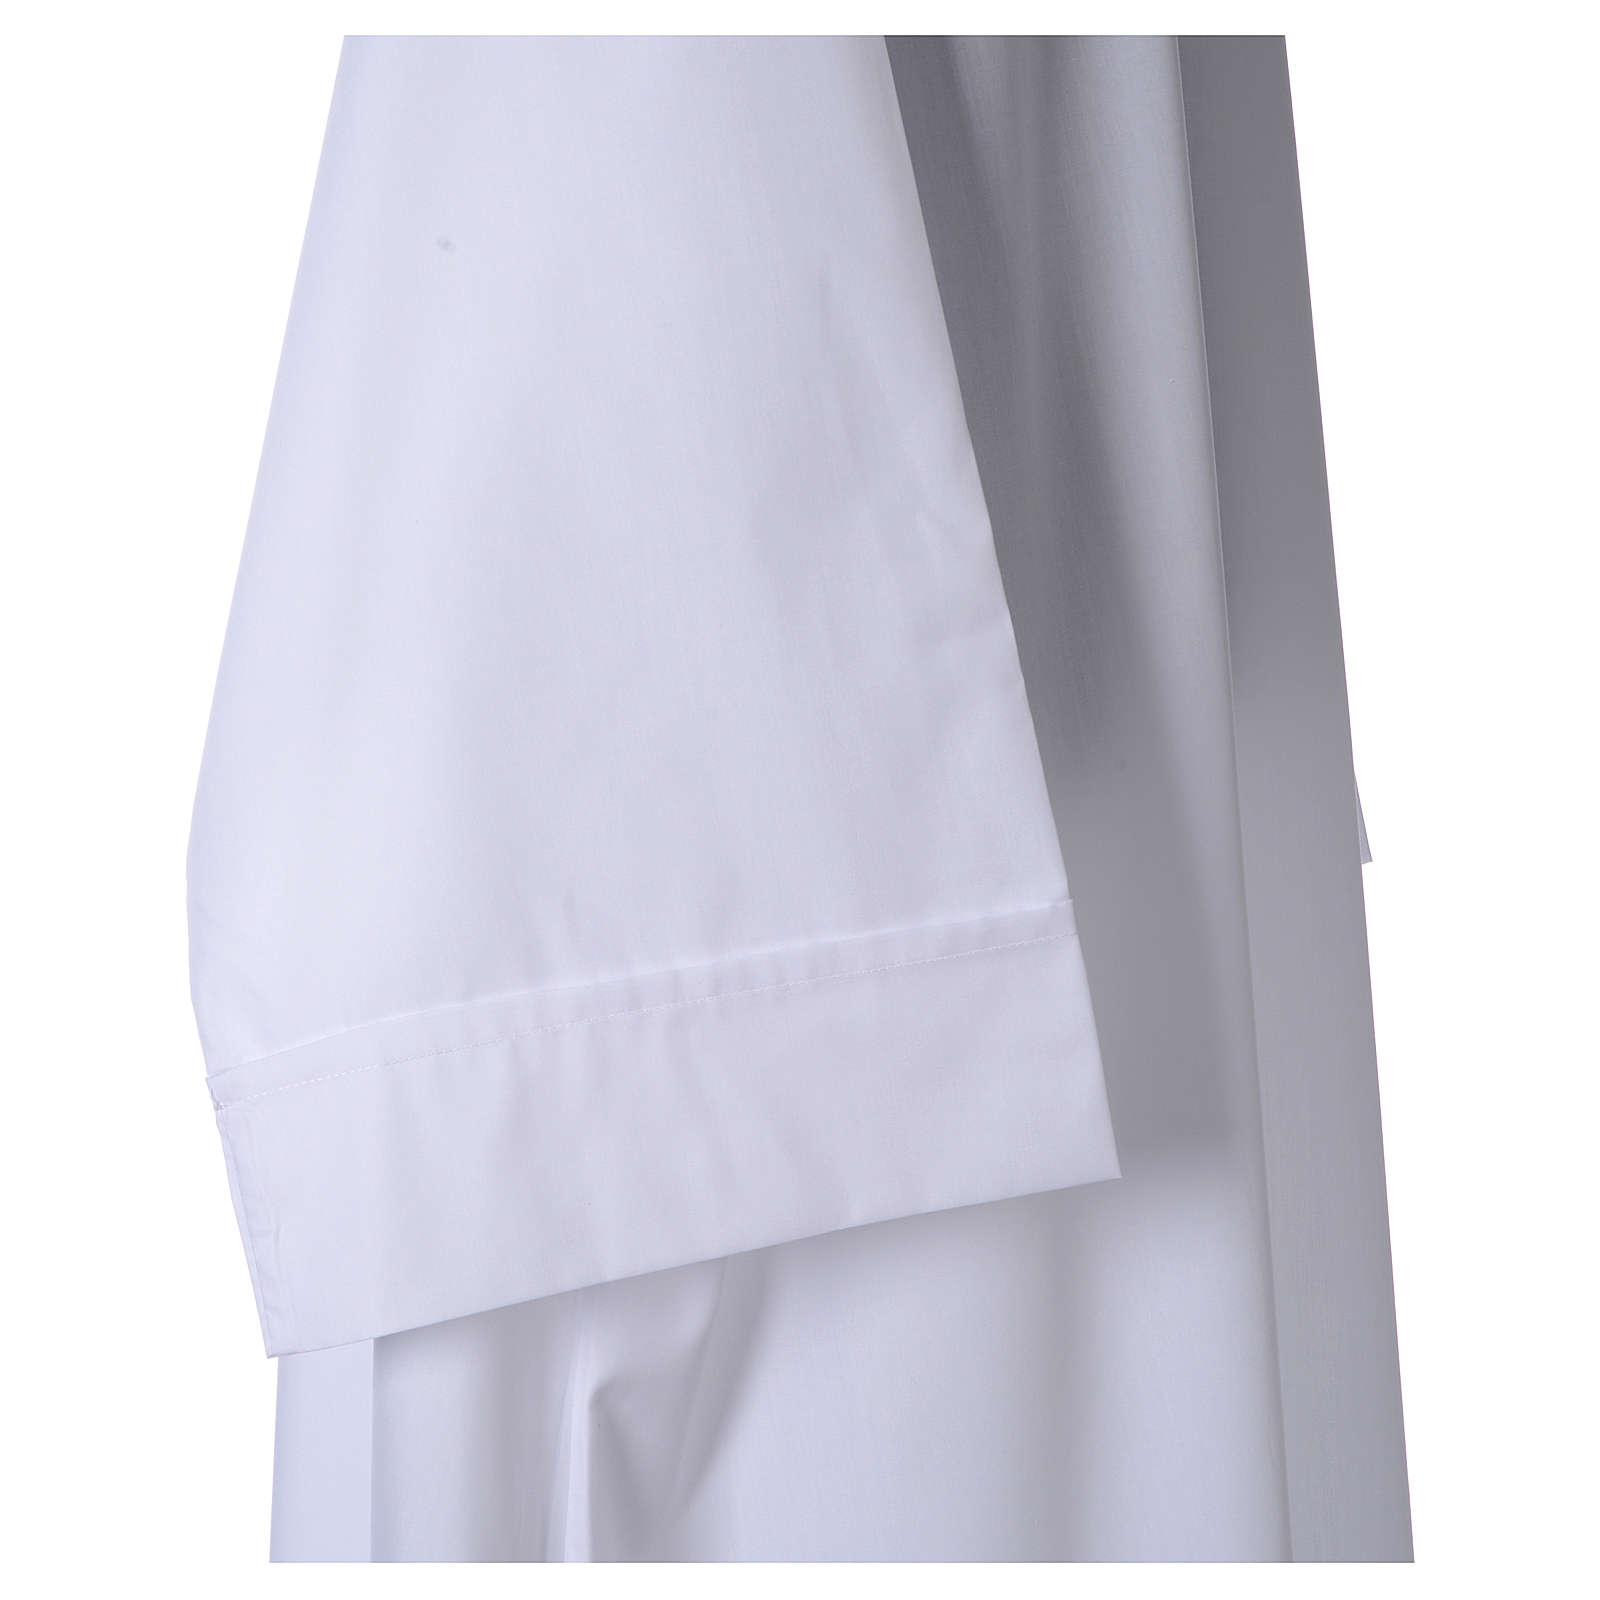 Alba blanca 65% pol. 35% algodón sencillo cremallera adelante 4